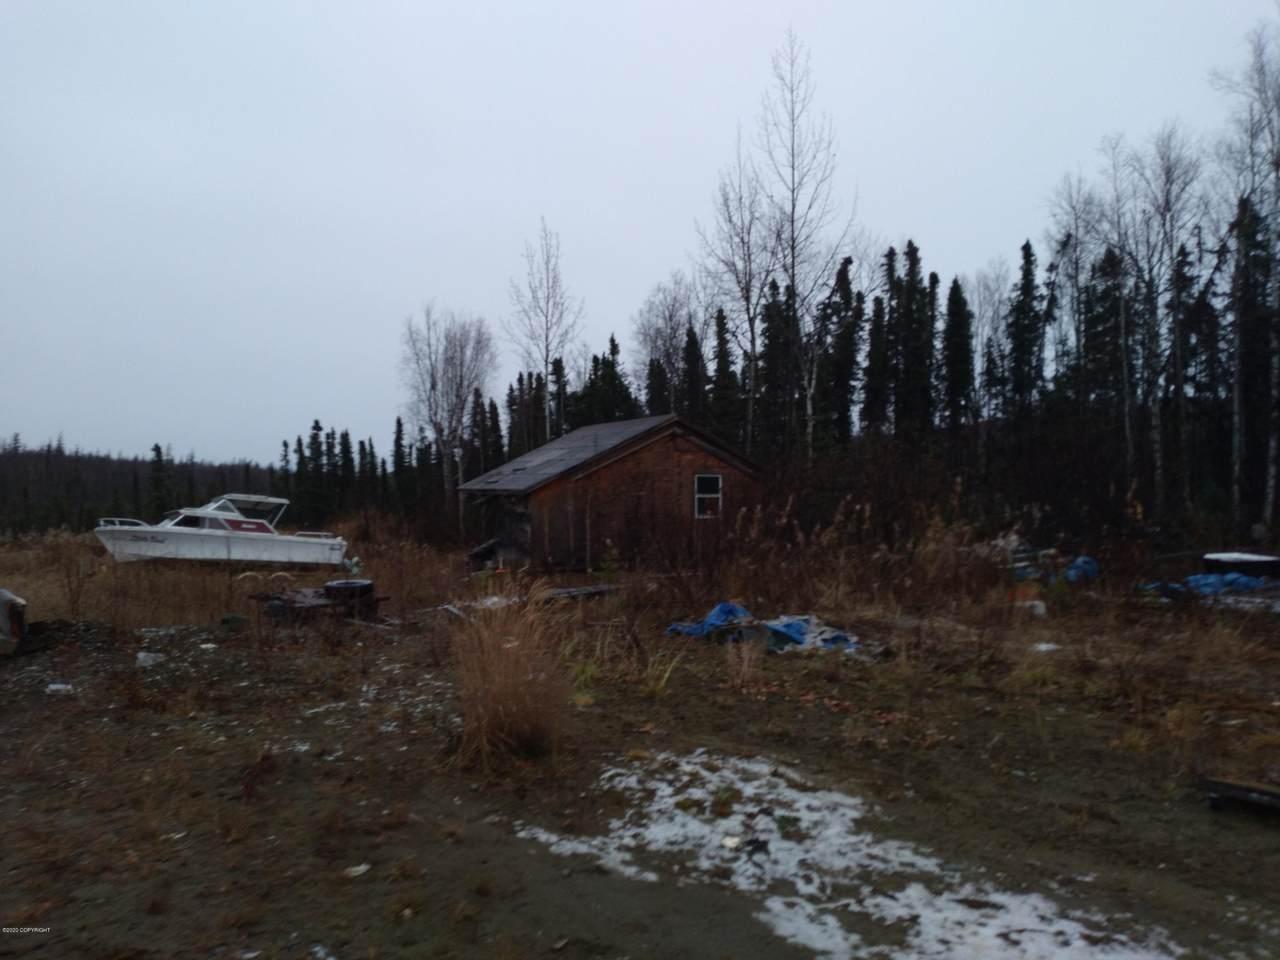 https://bt-photos.global.ssl.fastly.net/alaska/1280_boomver_1_20-16510-2.jpg